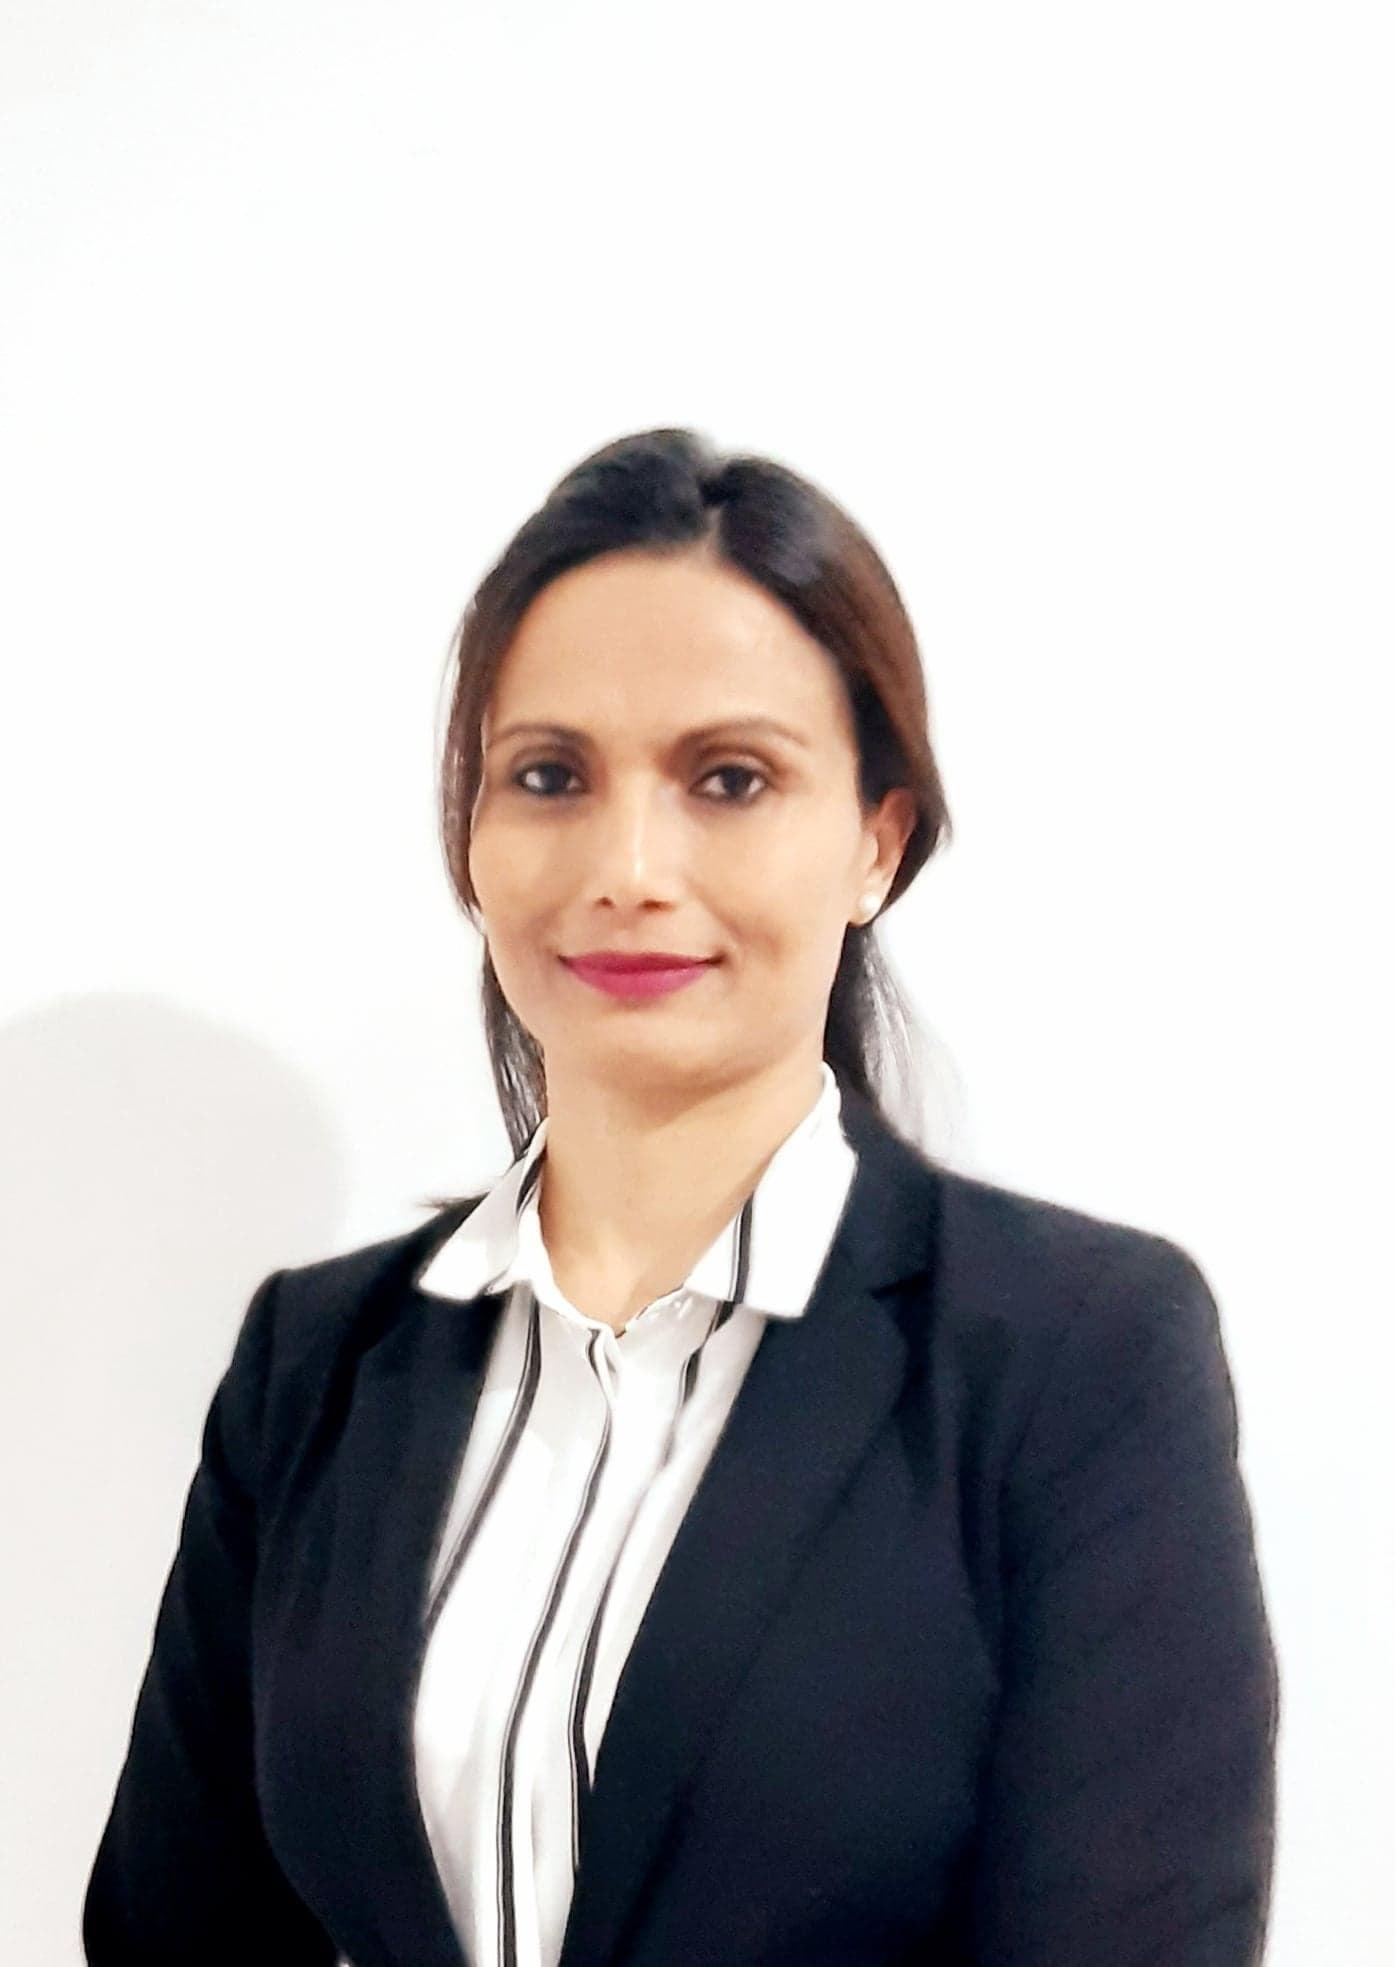 Bhawanee Tiwari